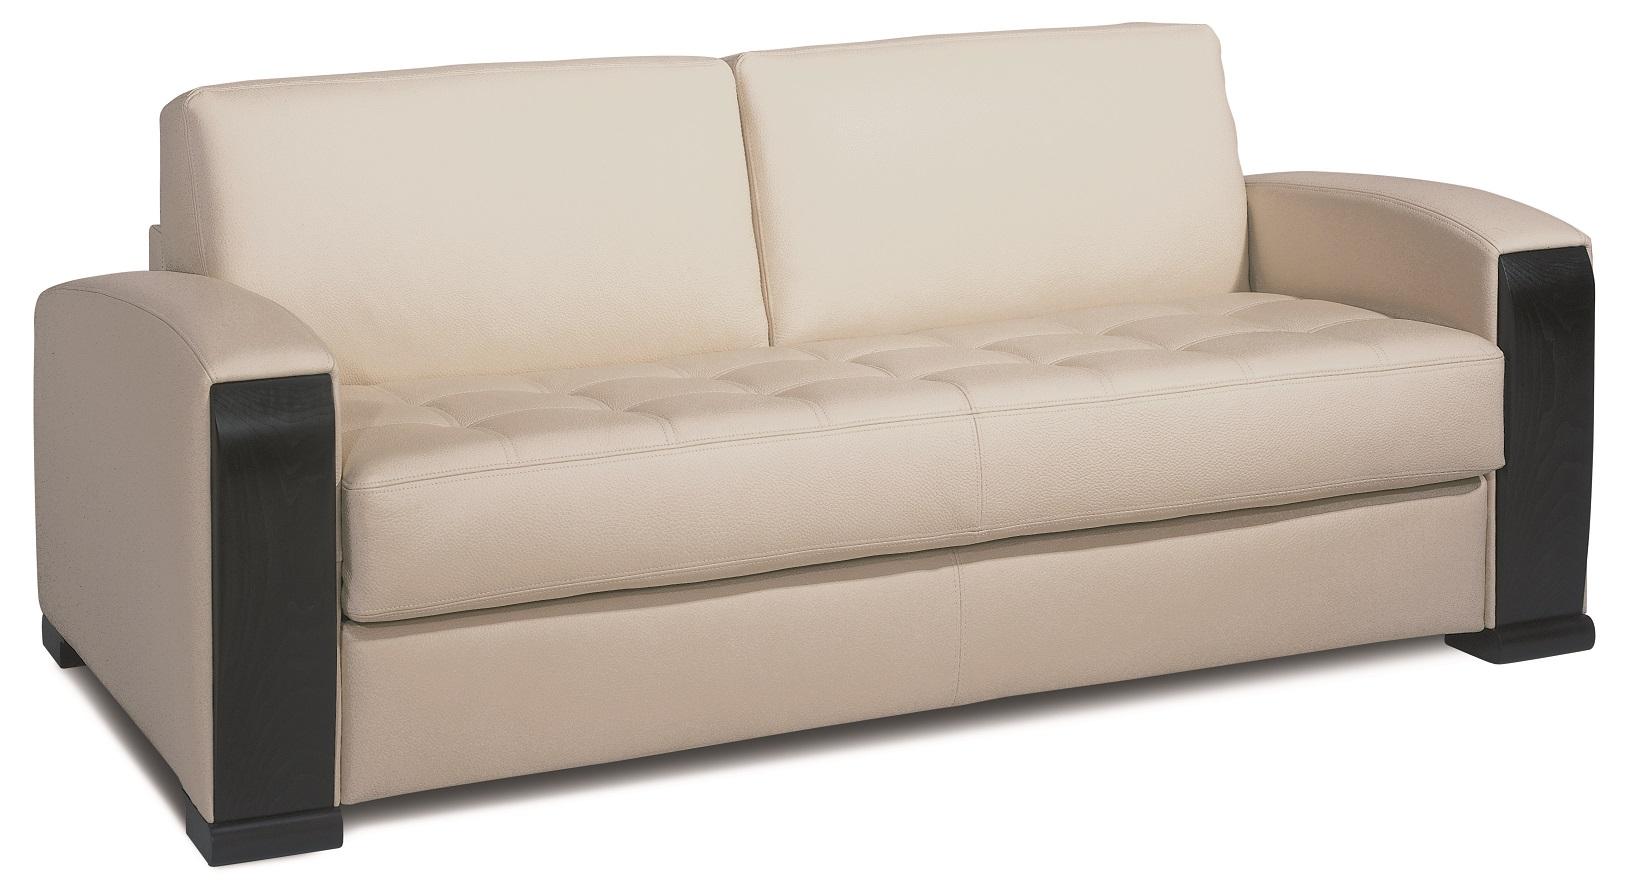 canap convertible madrid neology chez vestibule paris. Black Bedroom Furniture Sets. Home Design Ideas